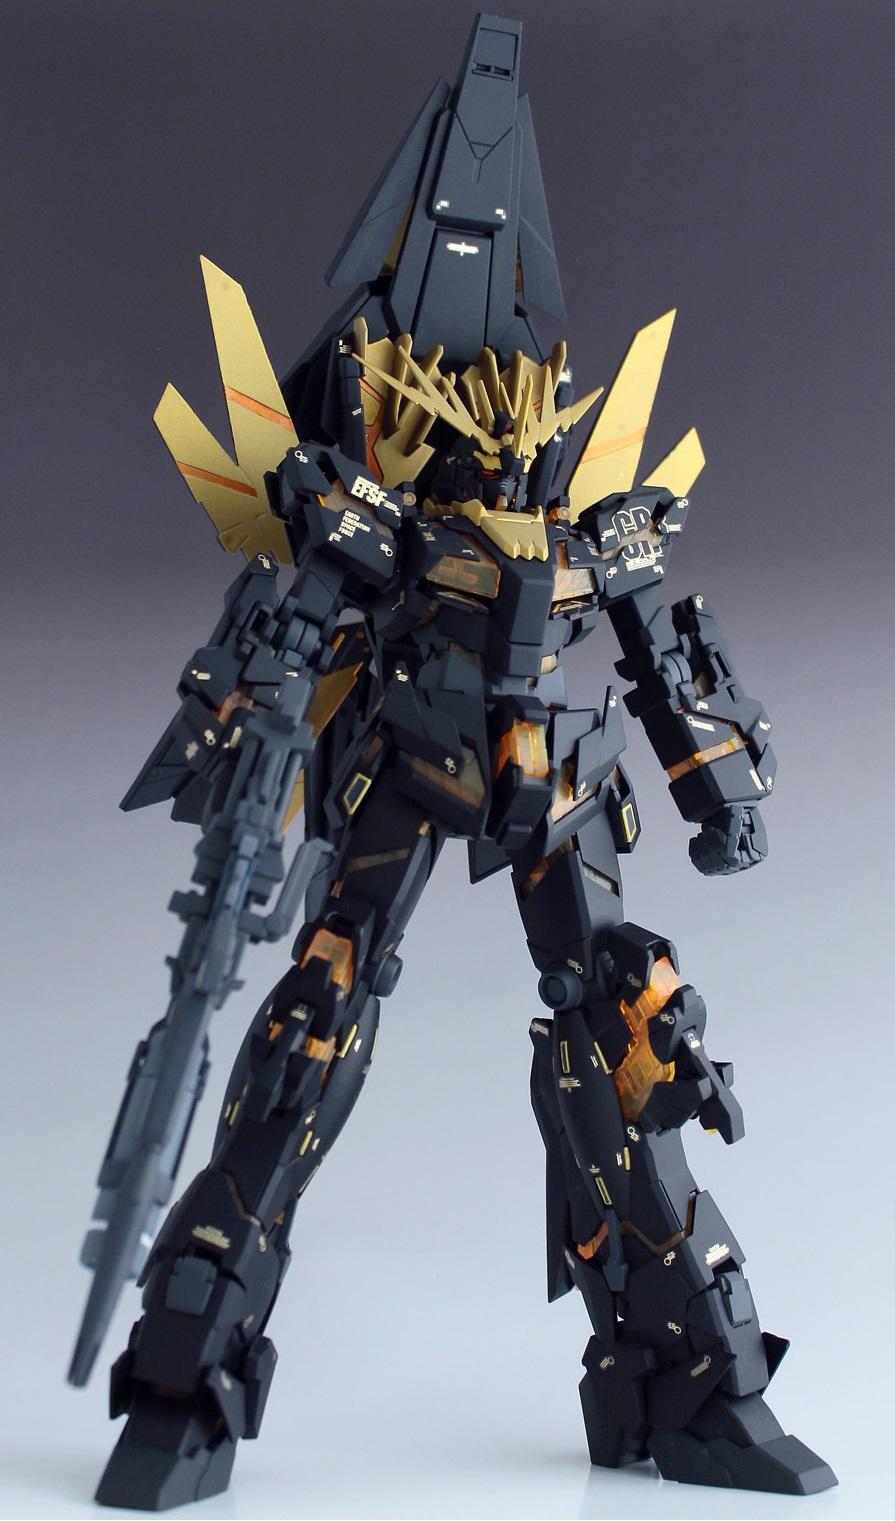 Mg 1 100 Rx 0 N Unicorn Gundam 02 Banshee Norn Remodeling Semi